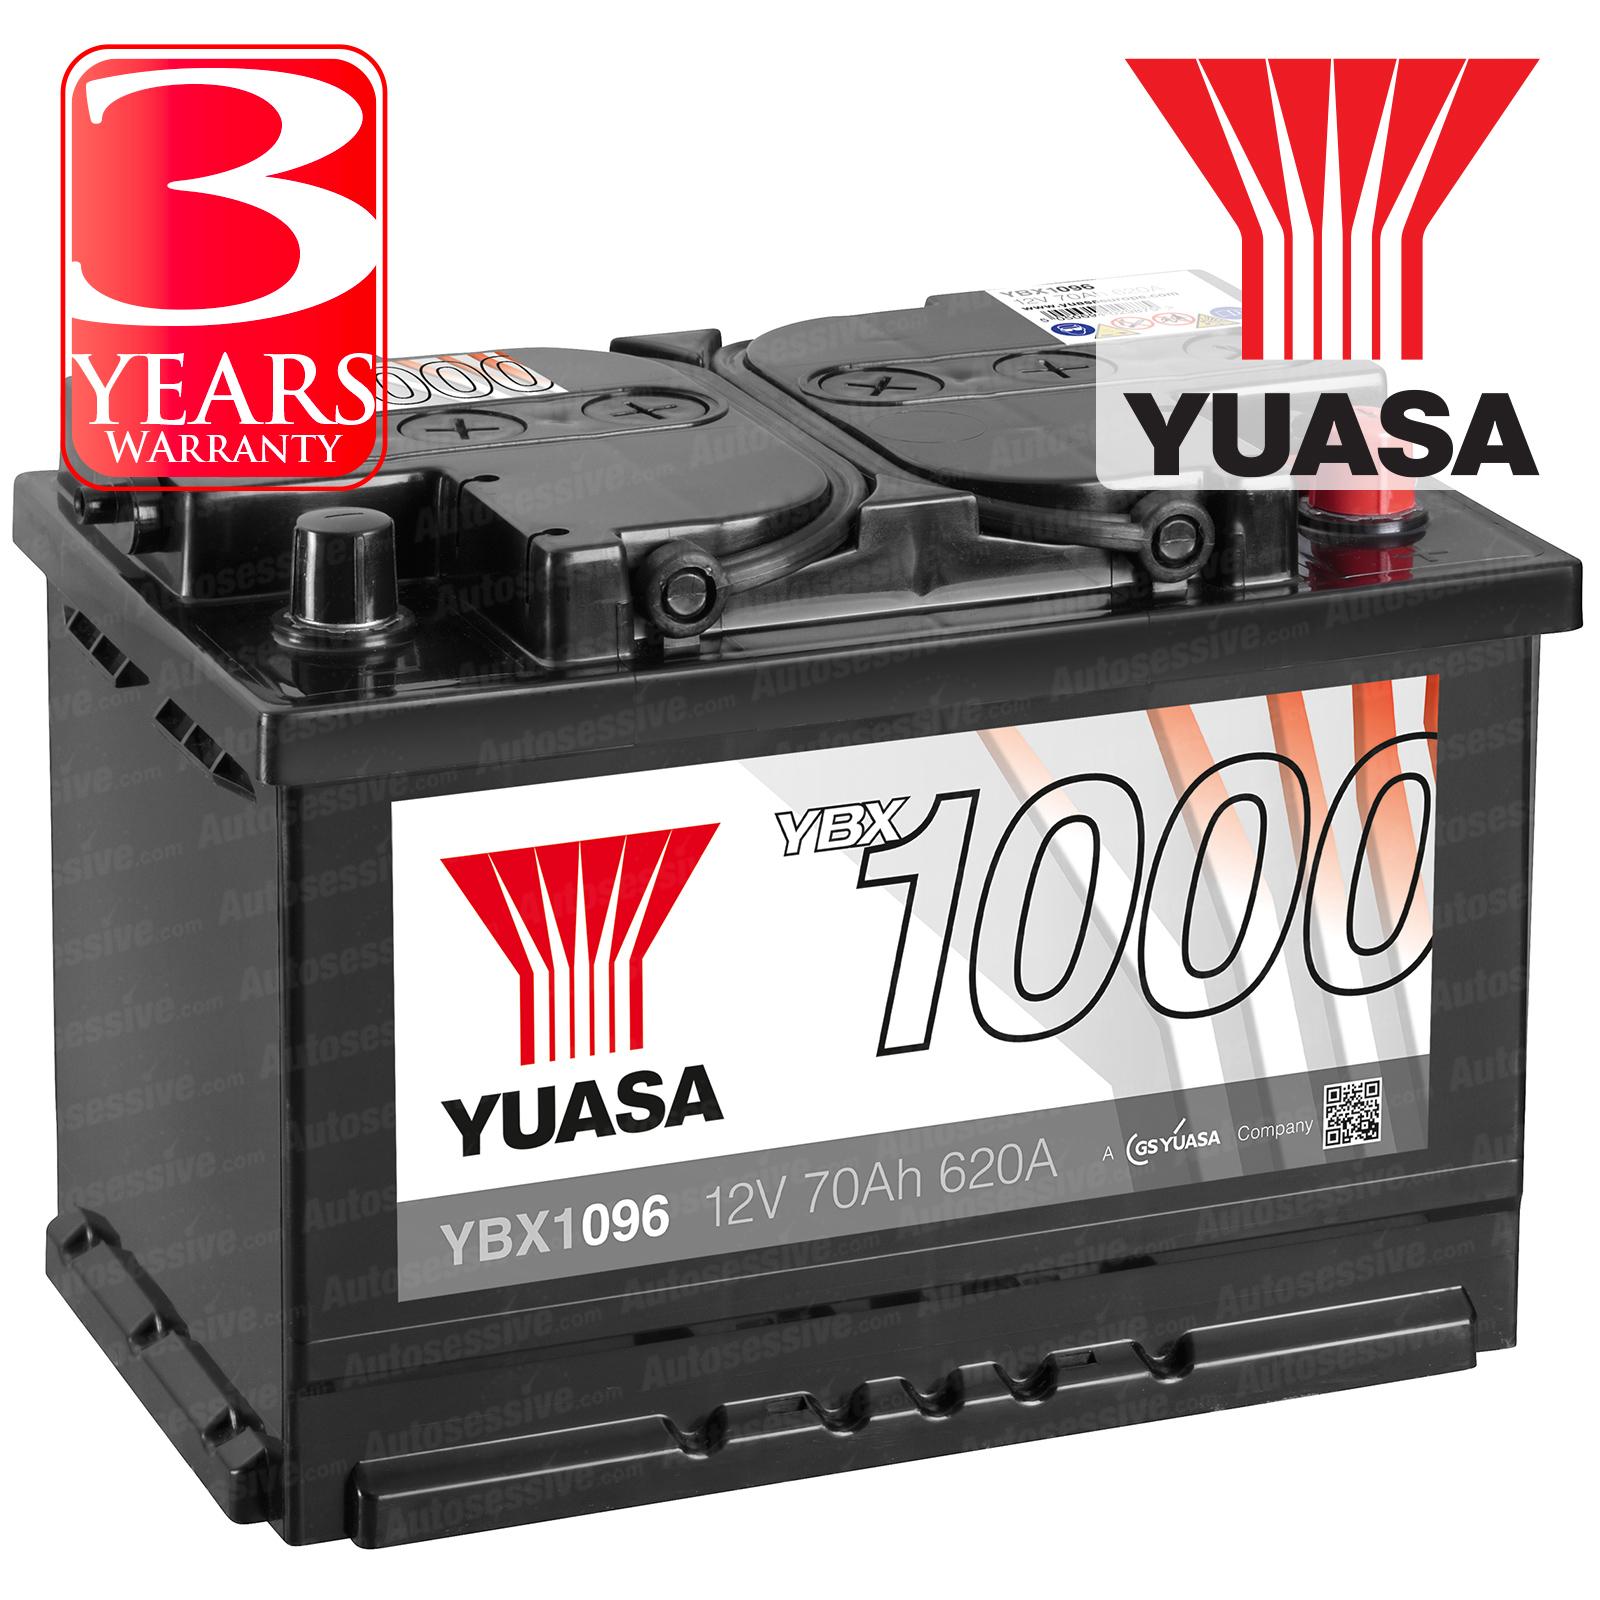 Yuasa Car Battery Calcium 12v 620cca 70ah T1 For Vw Transporter T5 1 9 Tdi Pd